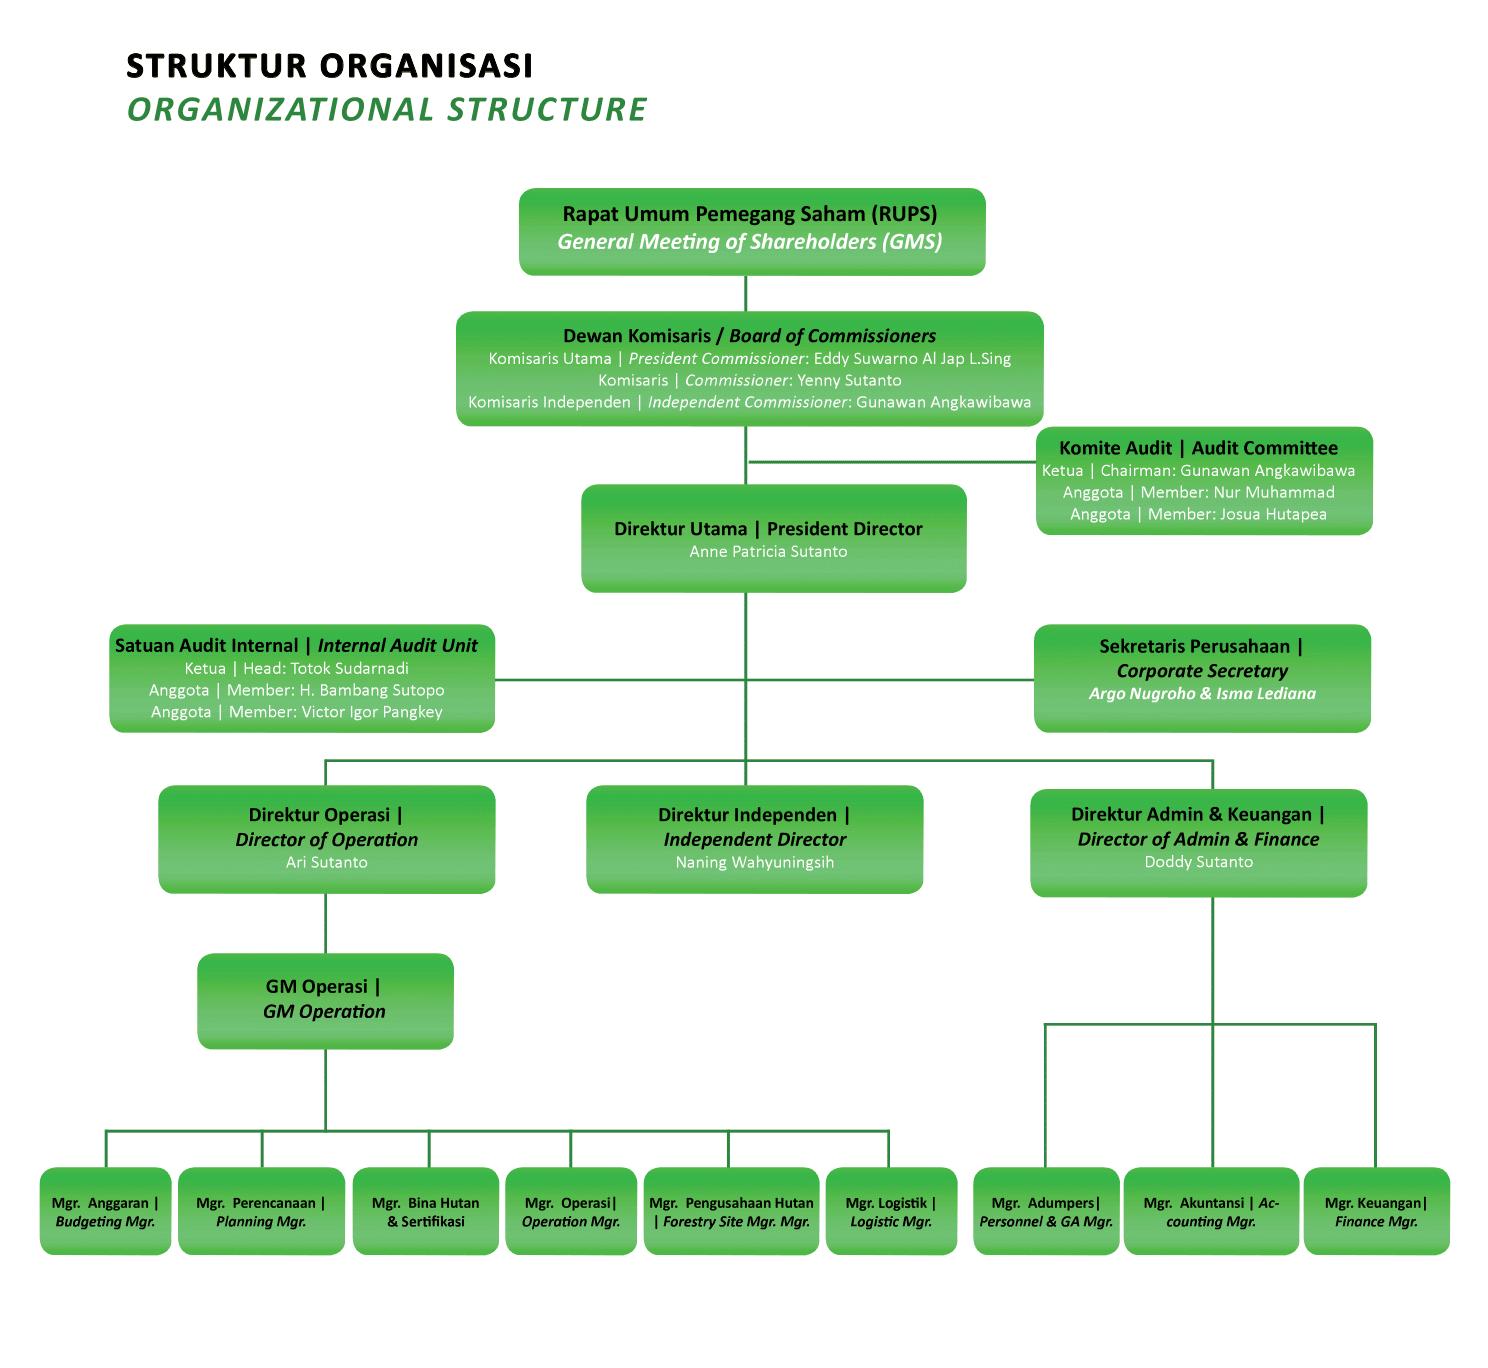 struktur organisasi \u2013 pt bumi teknokultura unggul, tbk Struktur Organisasi CV struktur organisasi